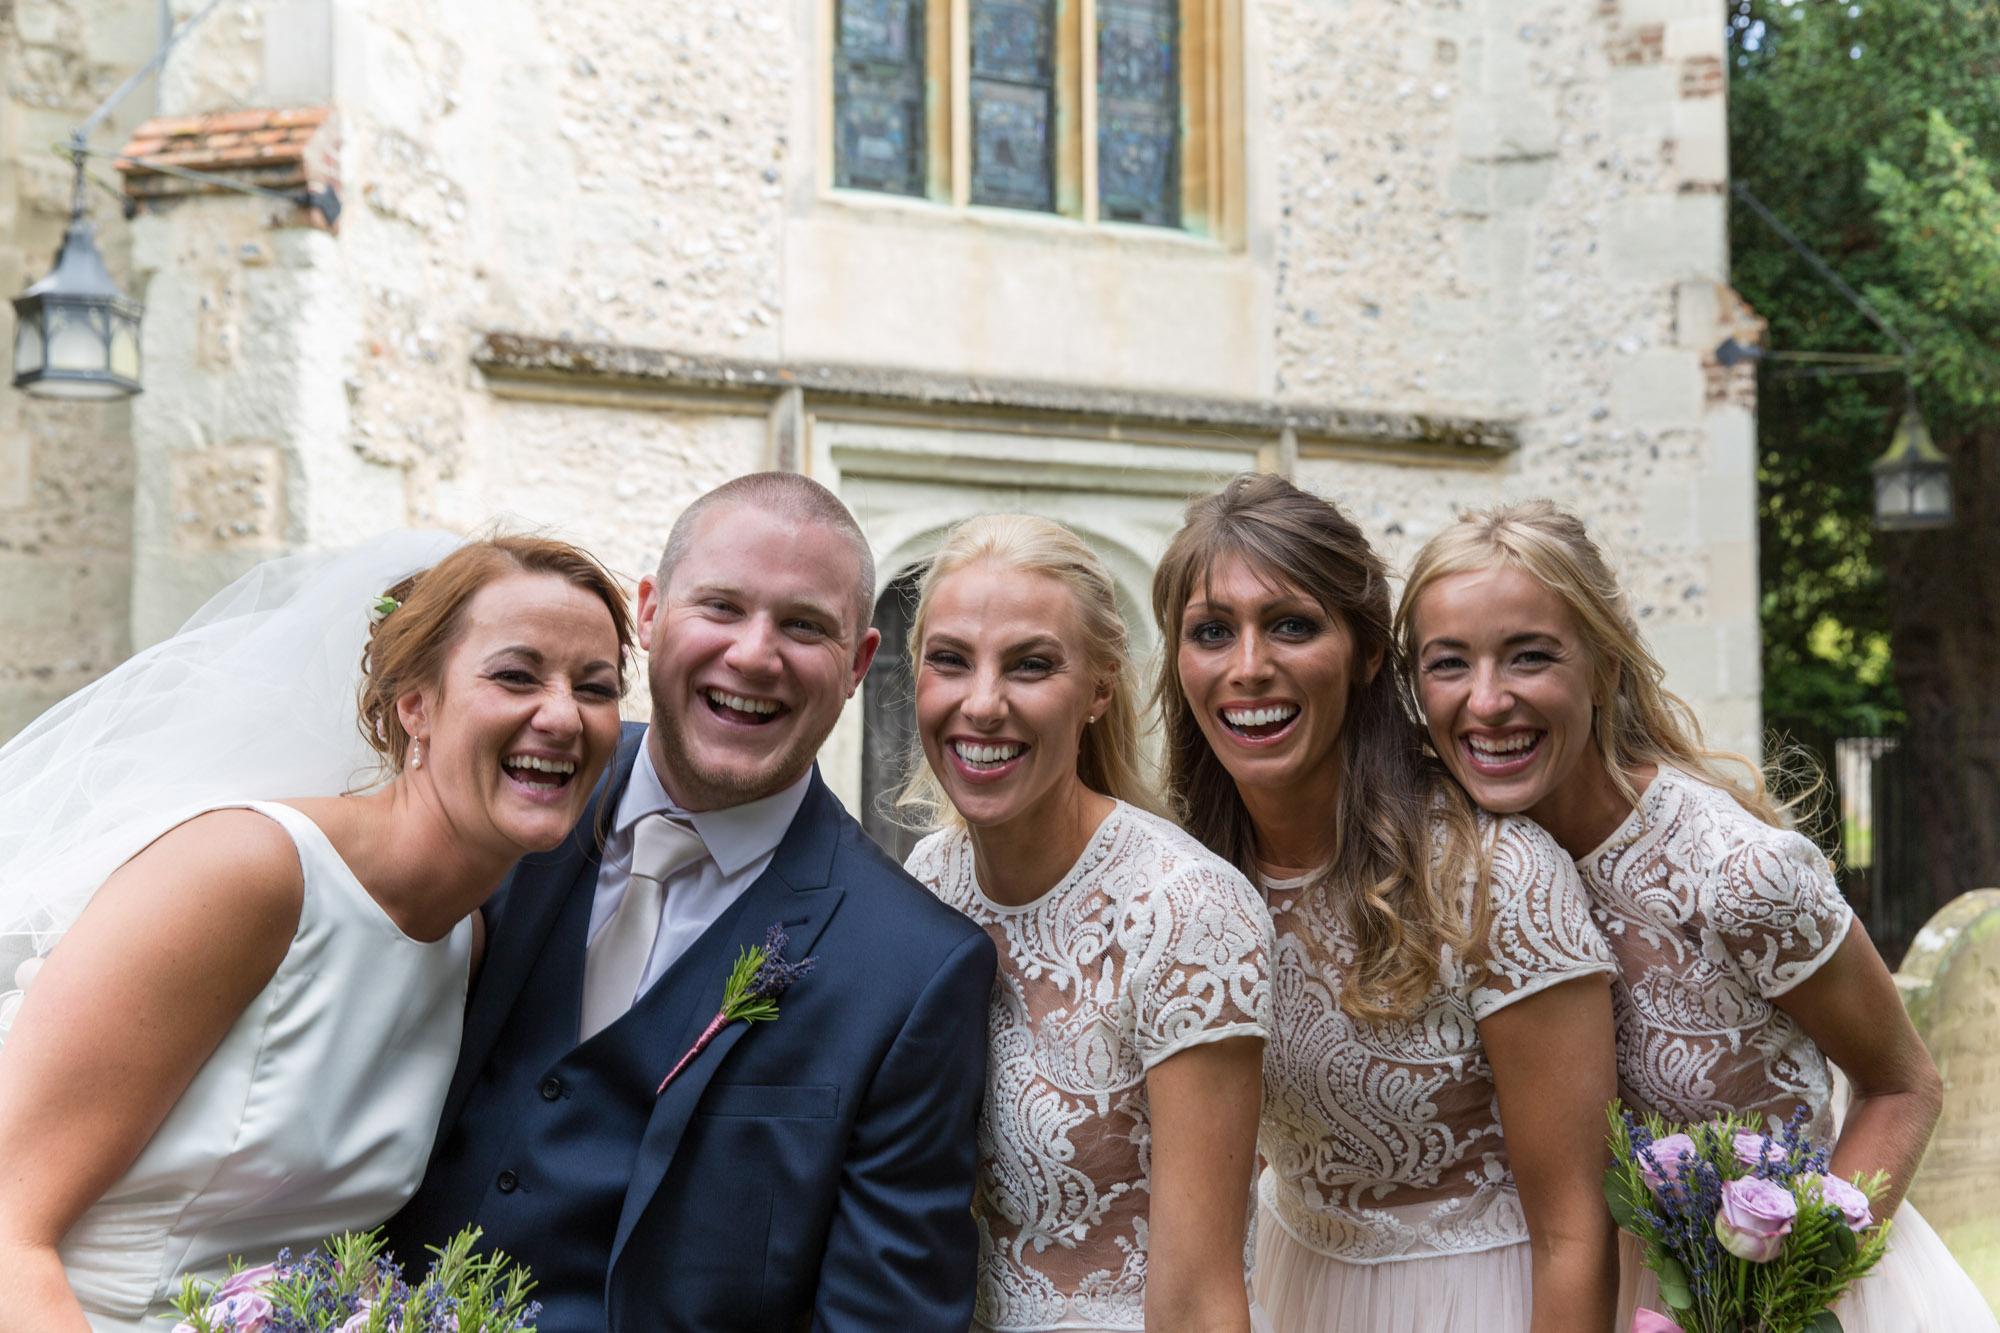 weddings-couples-love-photographer-oxford-london-jonathan-self-photography-53.jpg